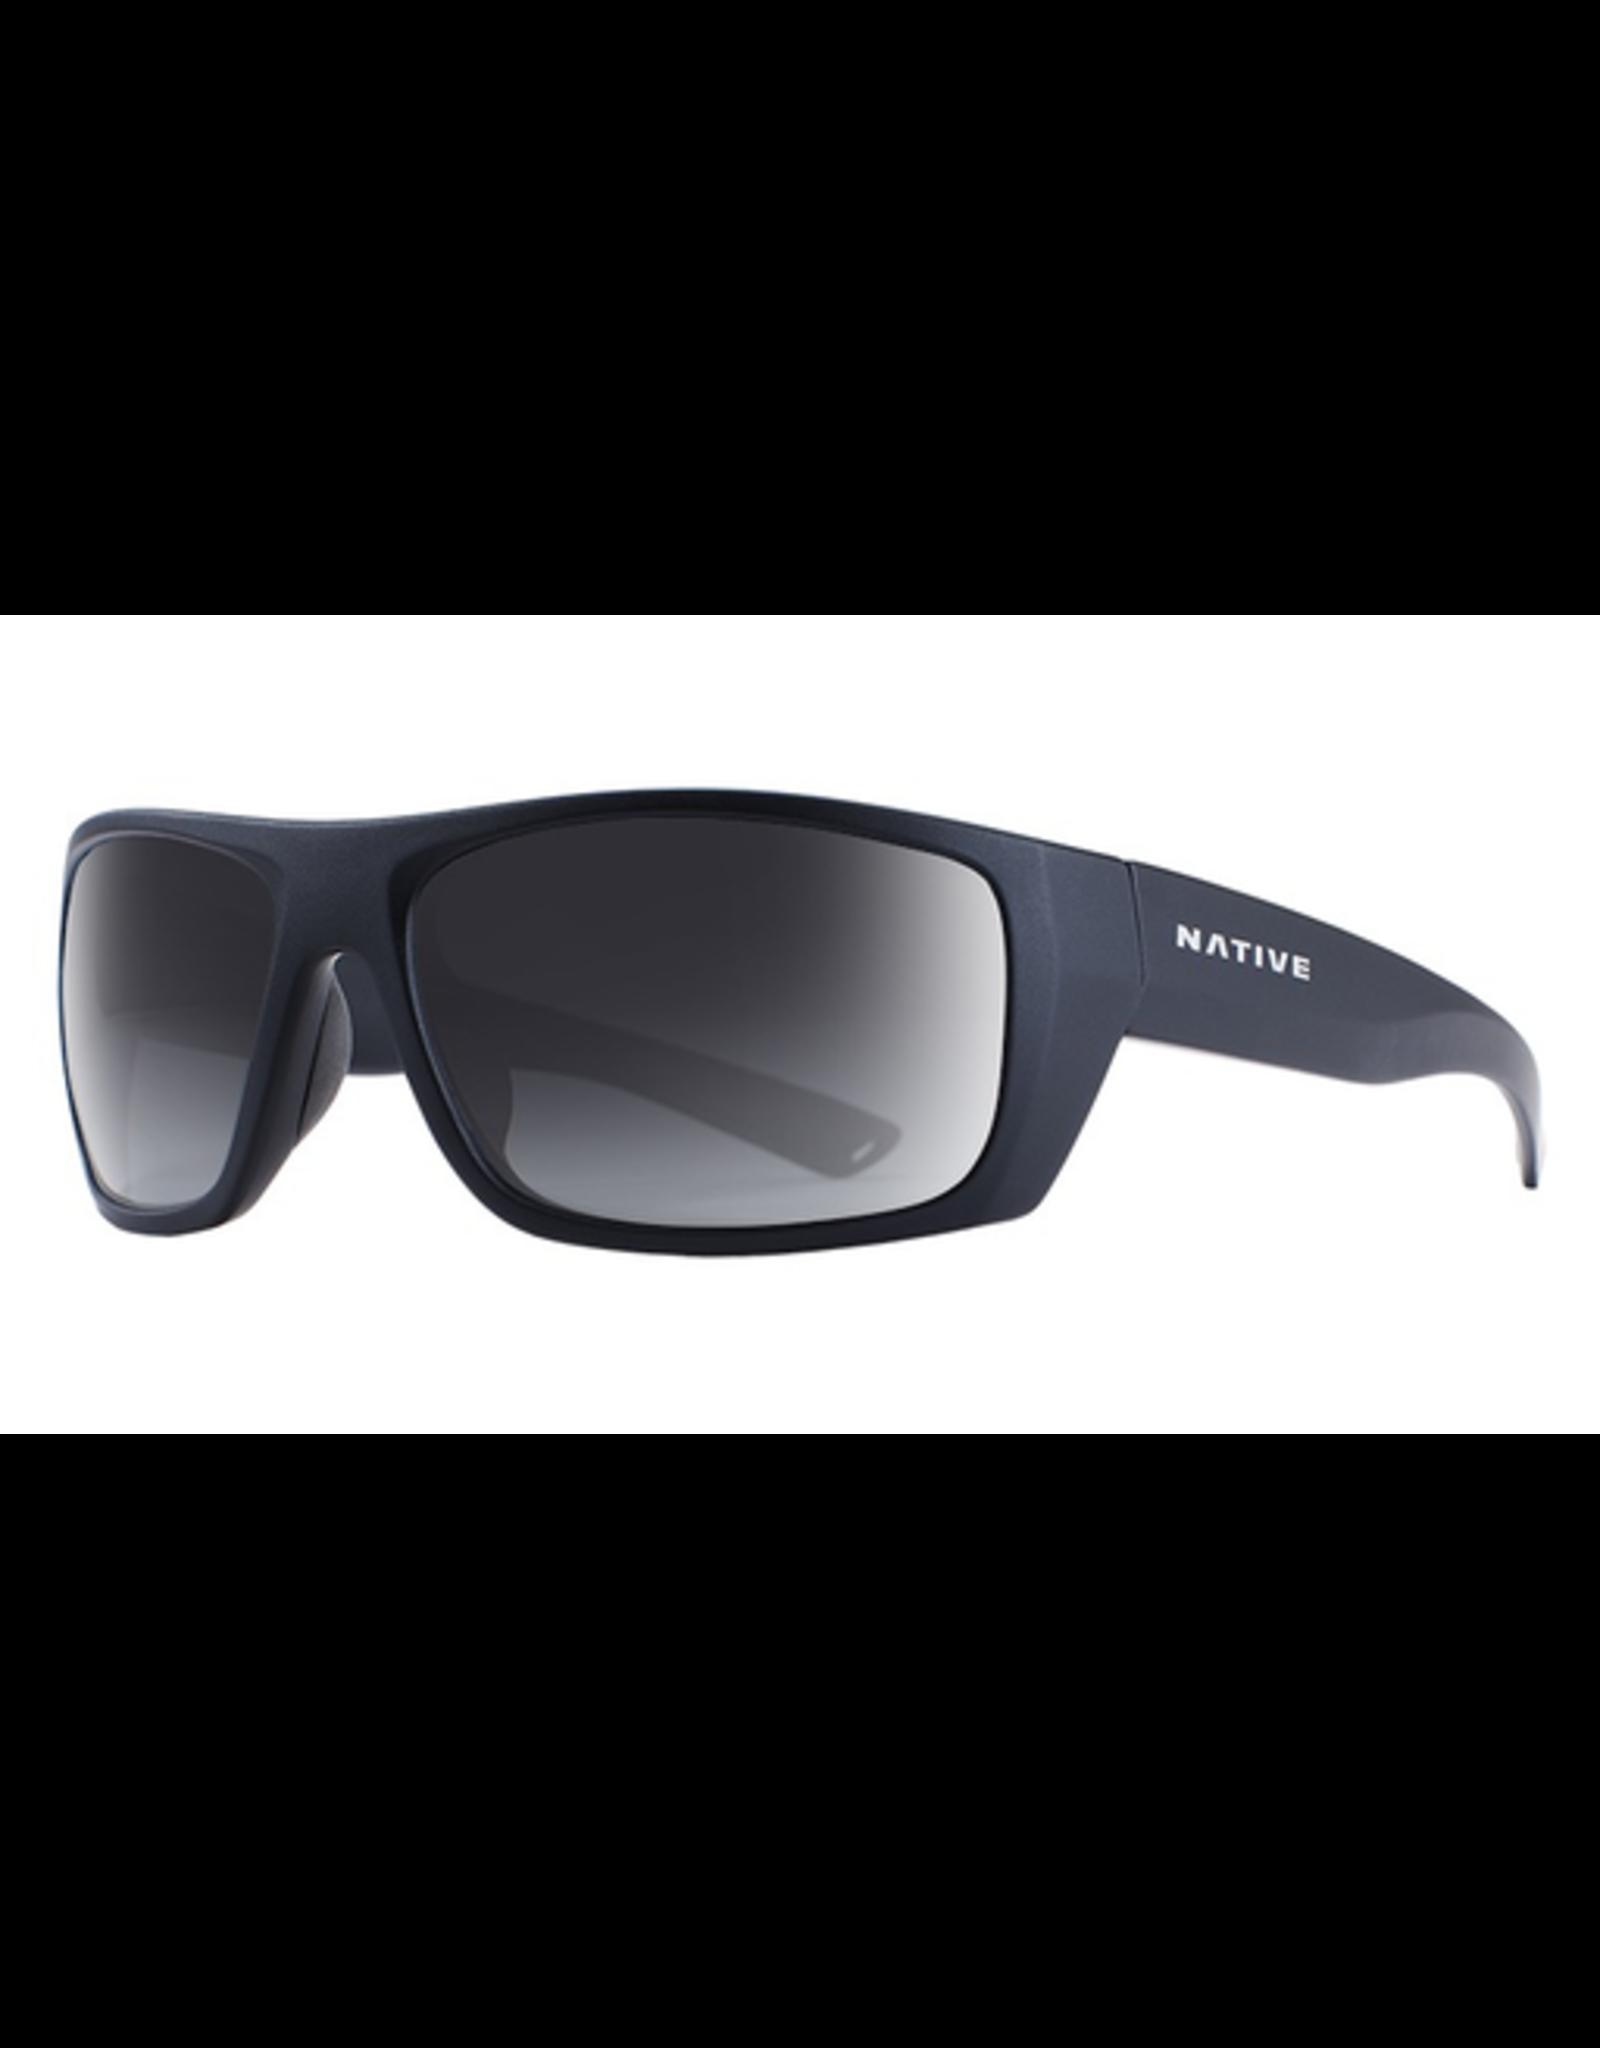 Native Eyewear Native Sunglasses Distiller, Frame Matte Black, Lens N3 Gray